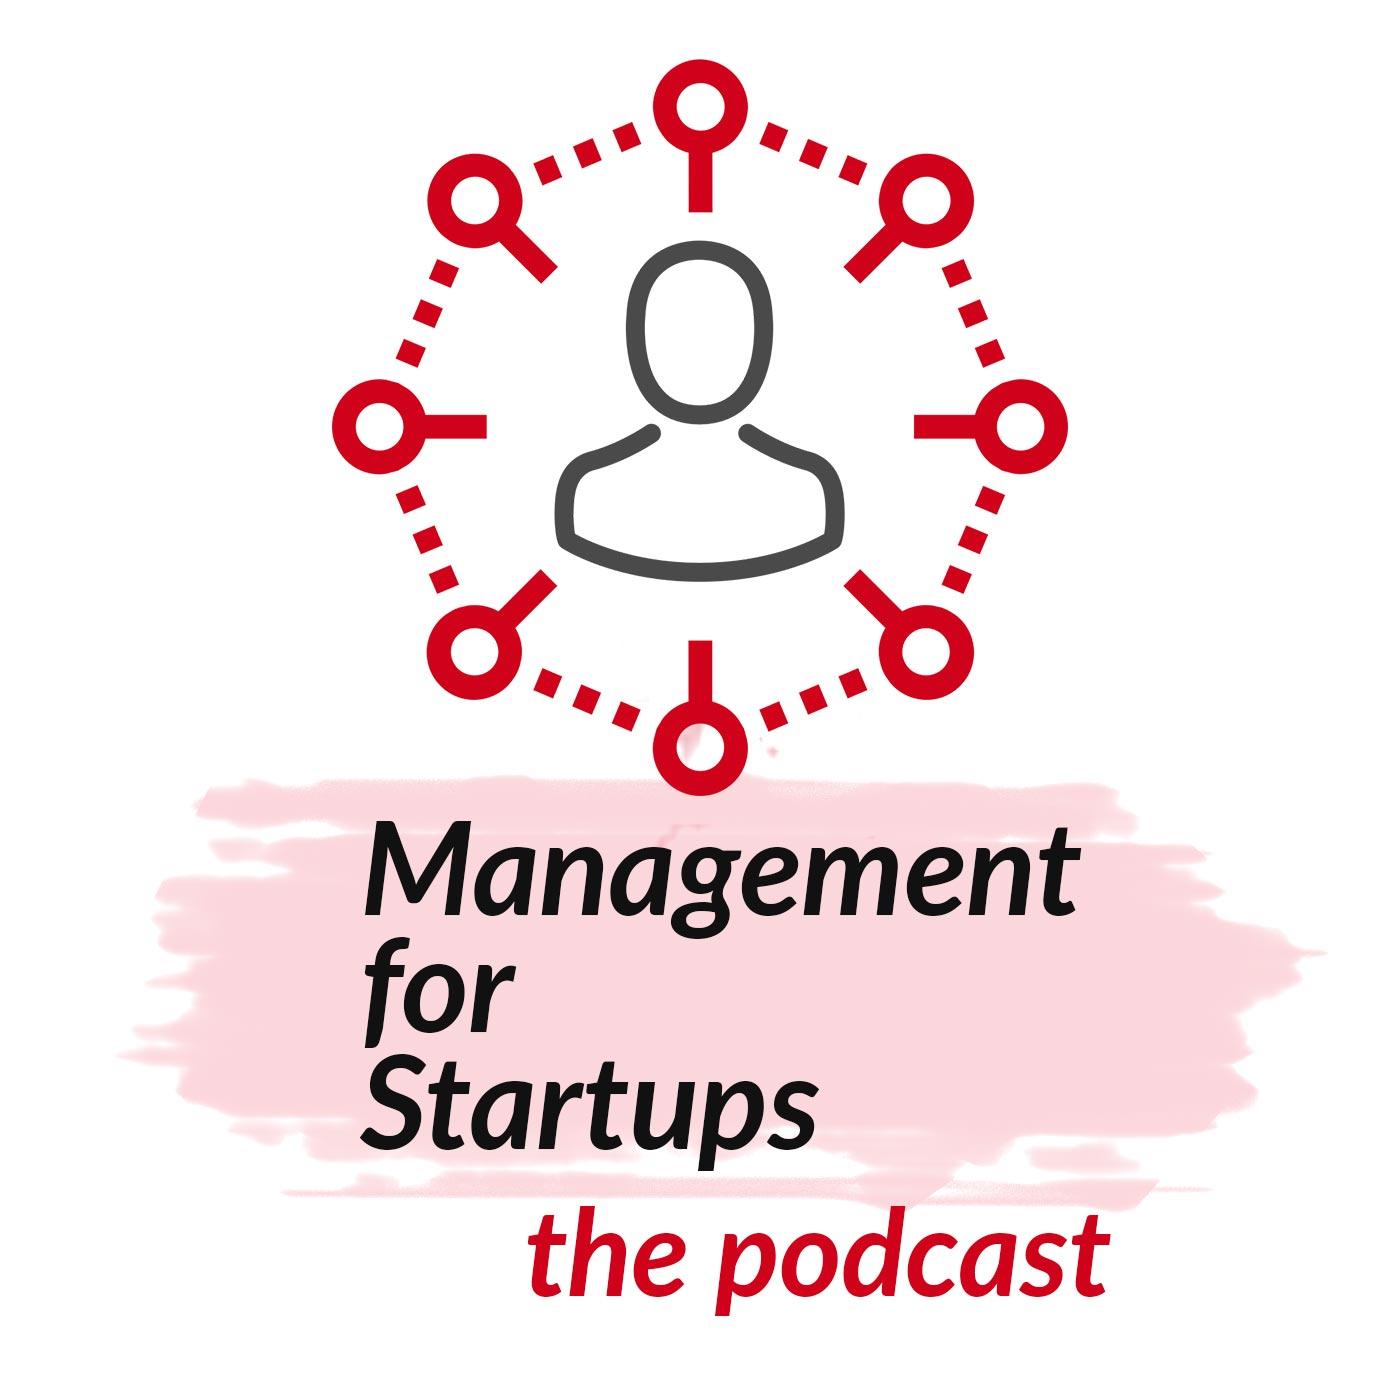 Management For Startups Podcast show art